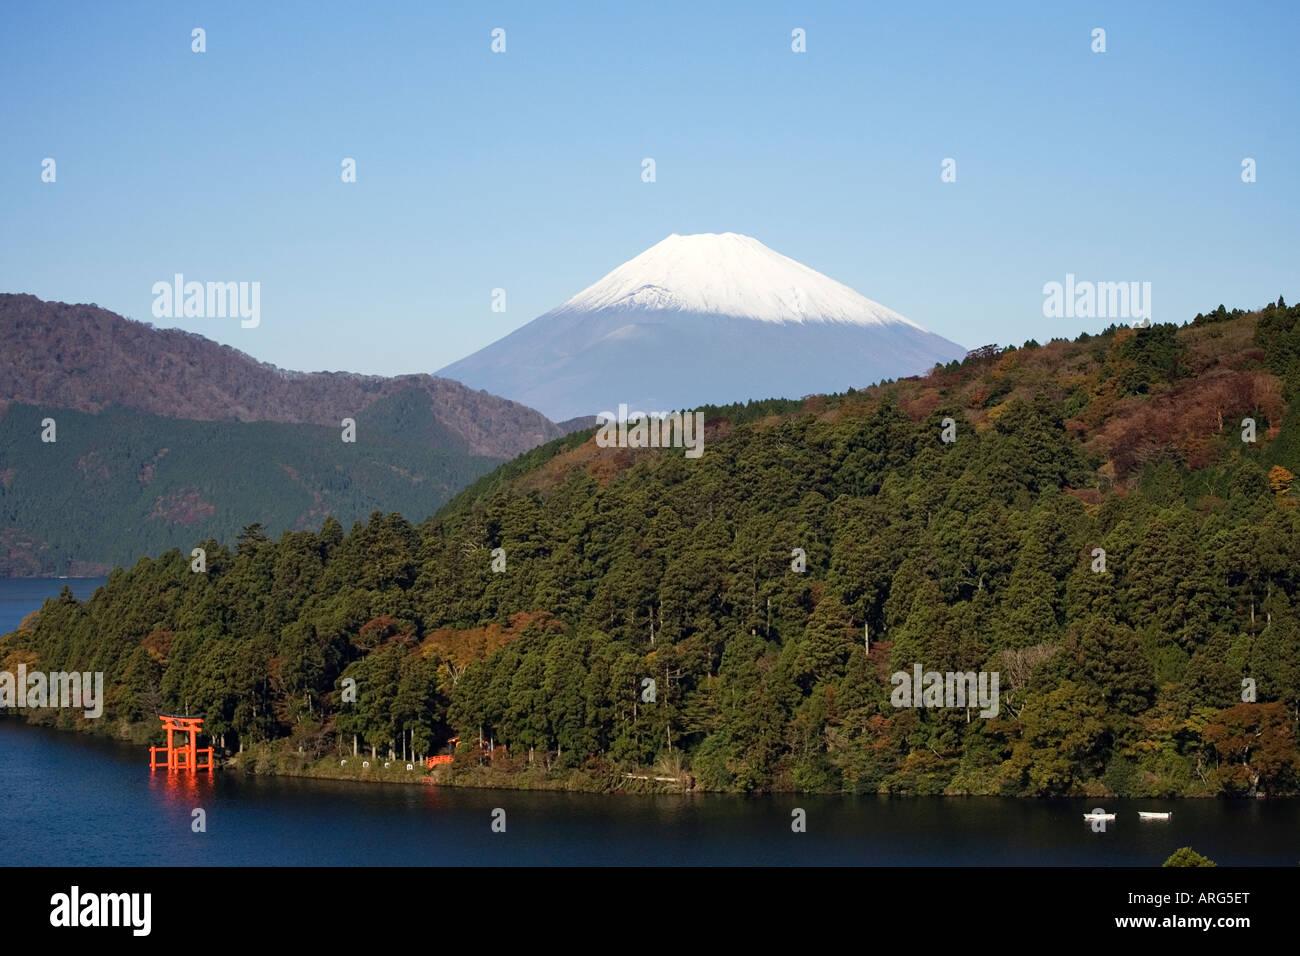 Distant view of Mt Fuji from lake Ashi Kanagawa prefecture Japan - Stock Image